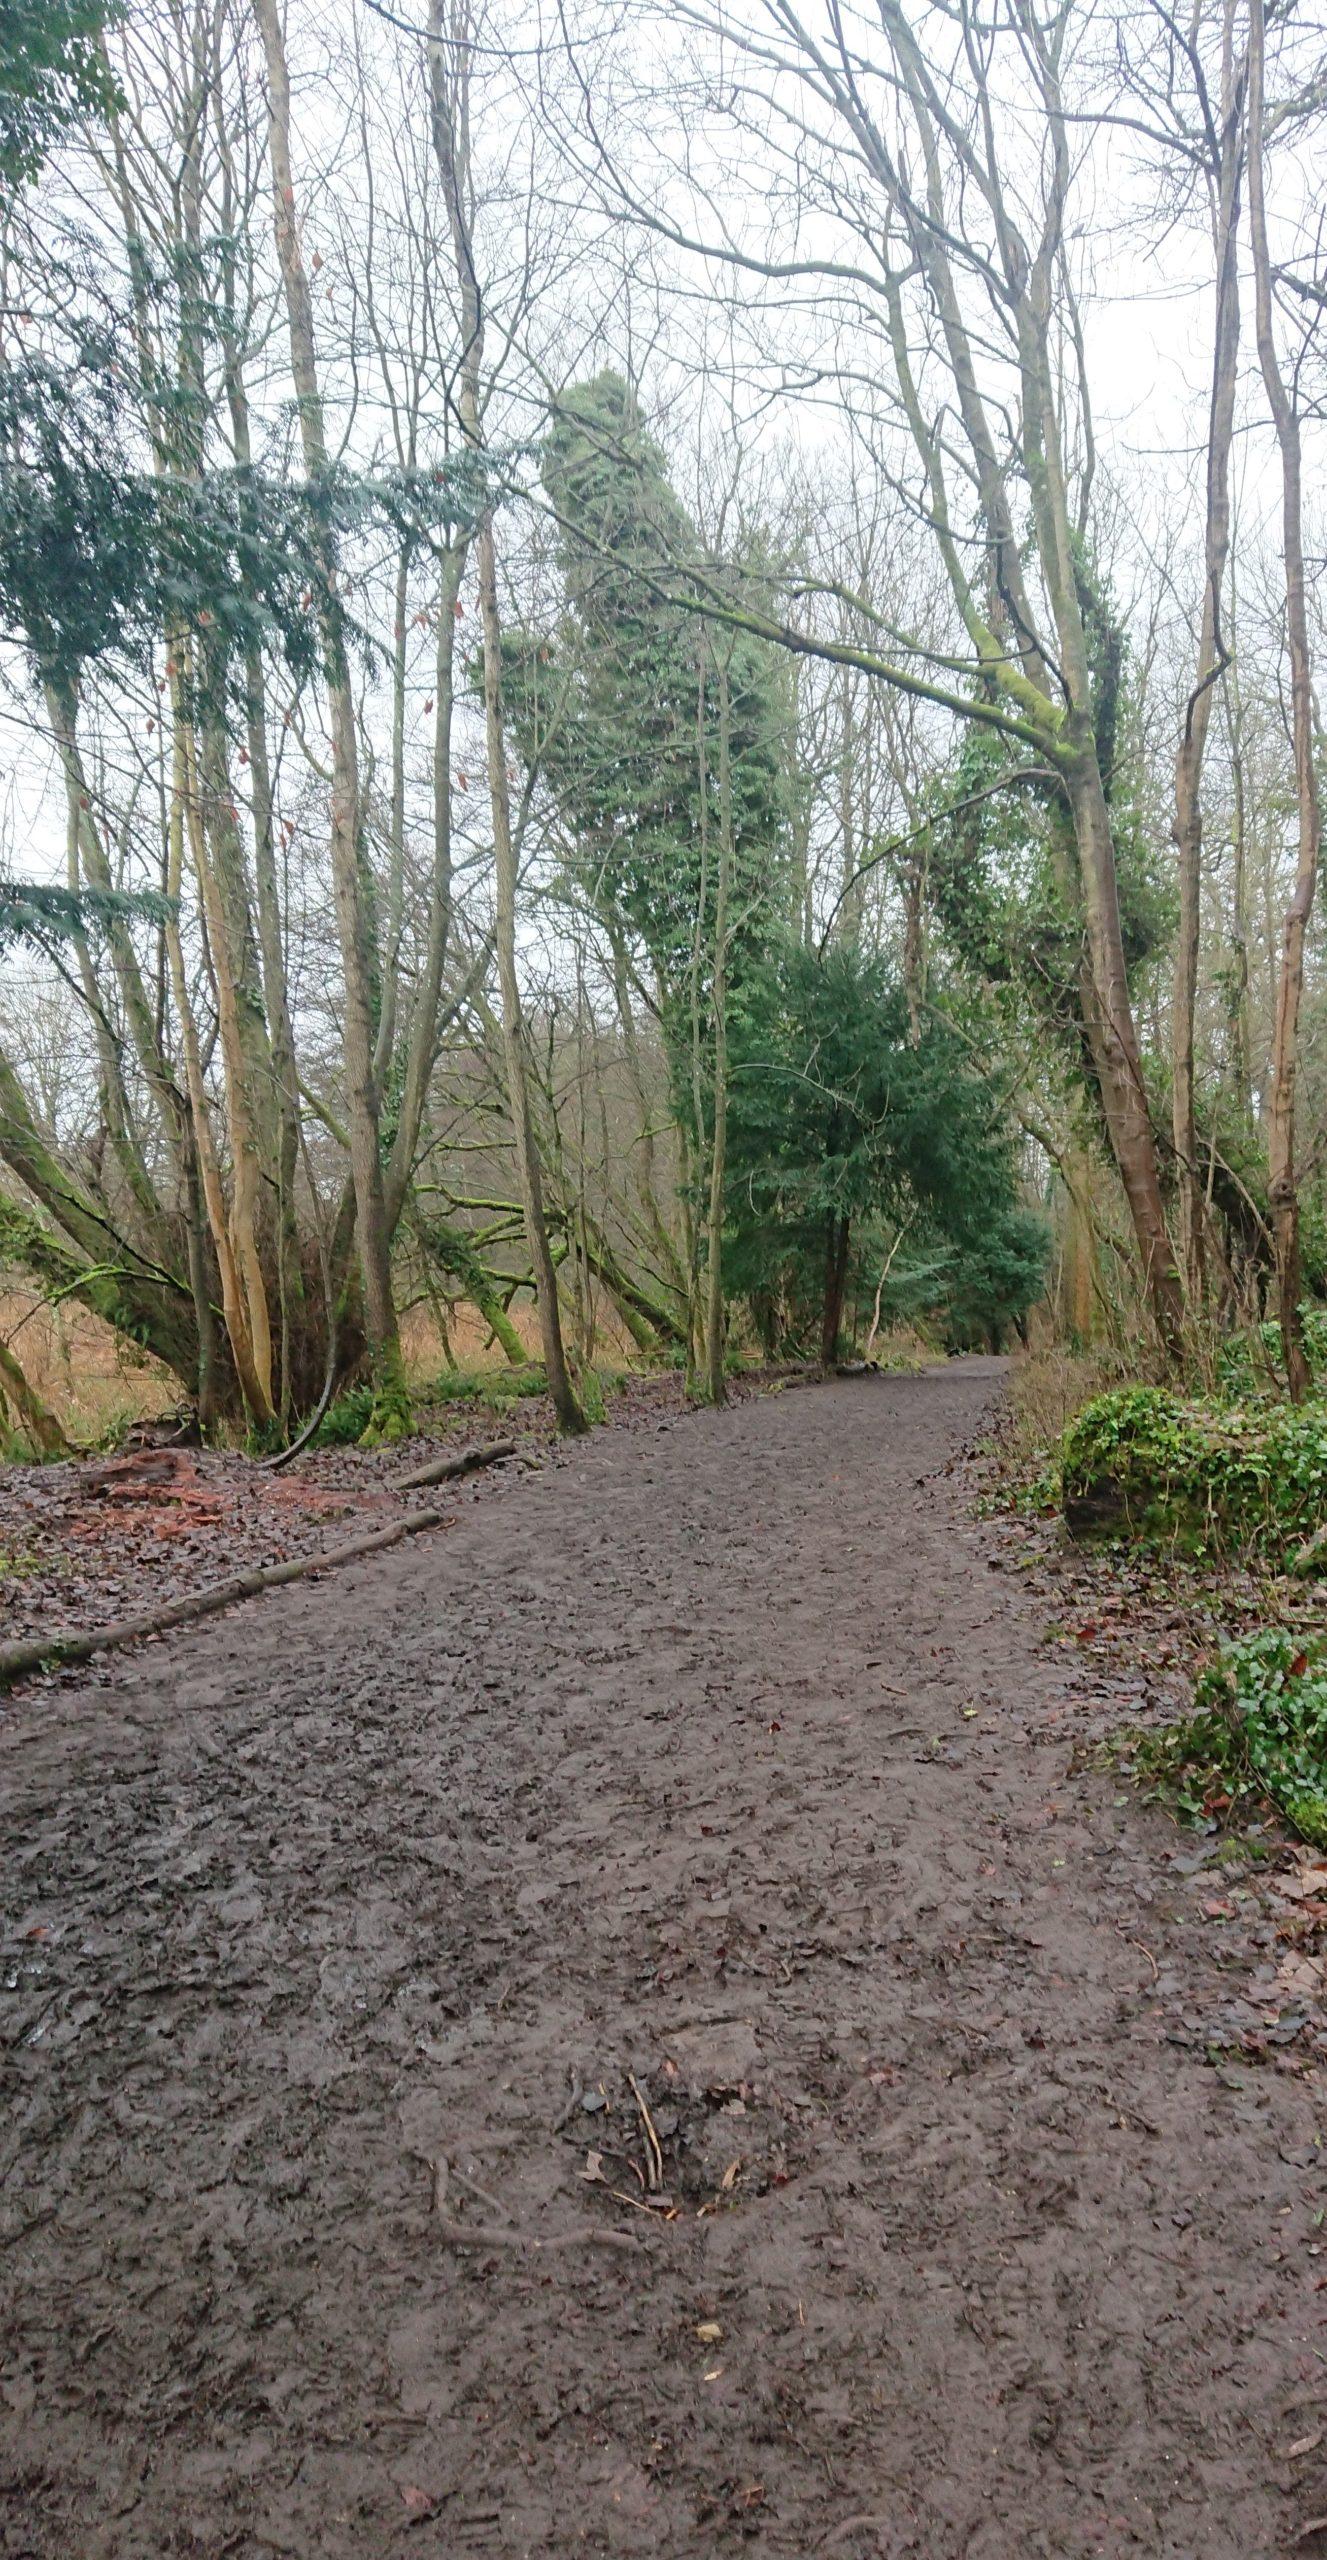 Muddy path at Stanton Woods Wiltshire